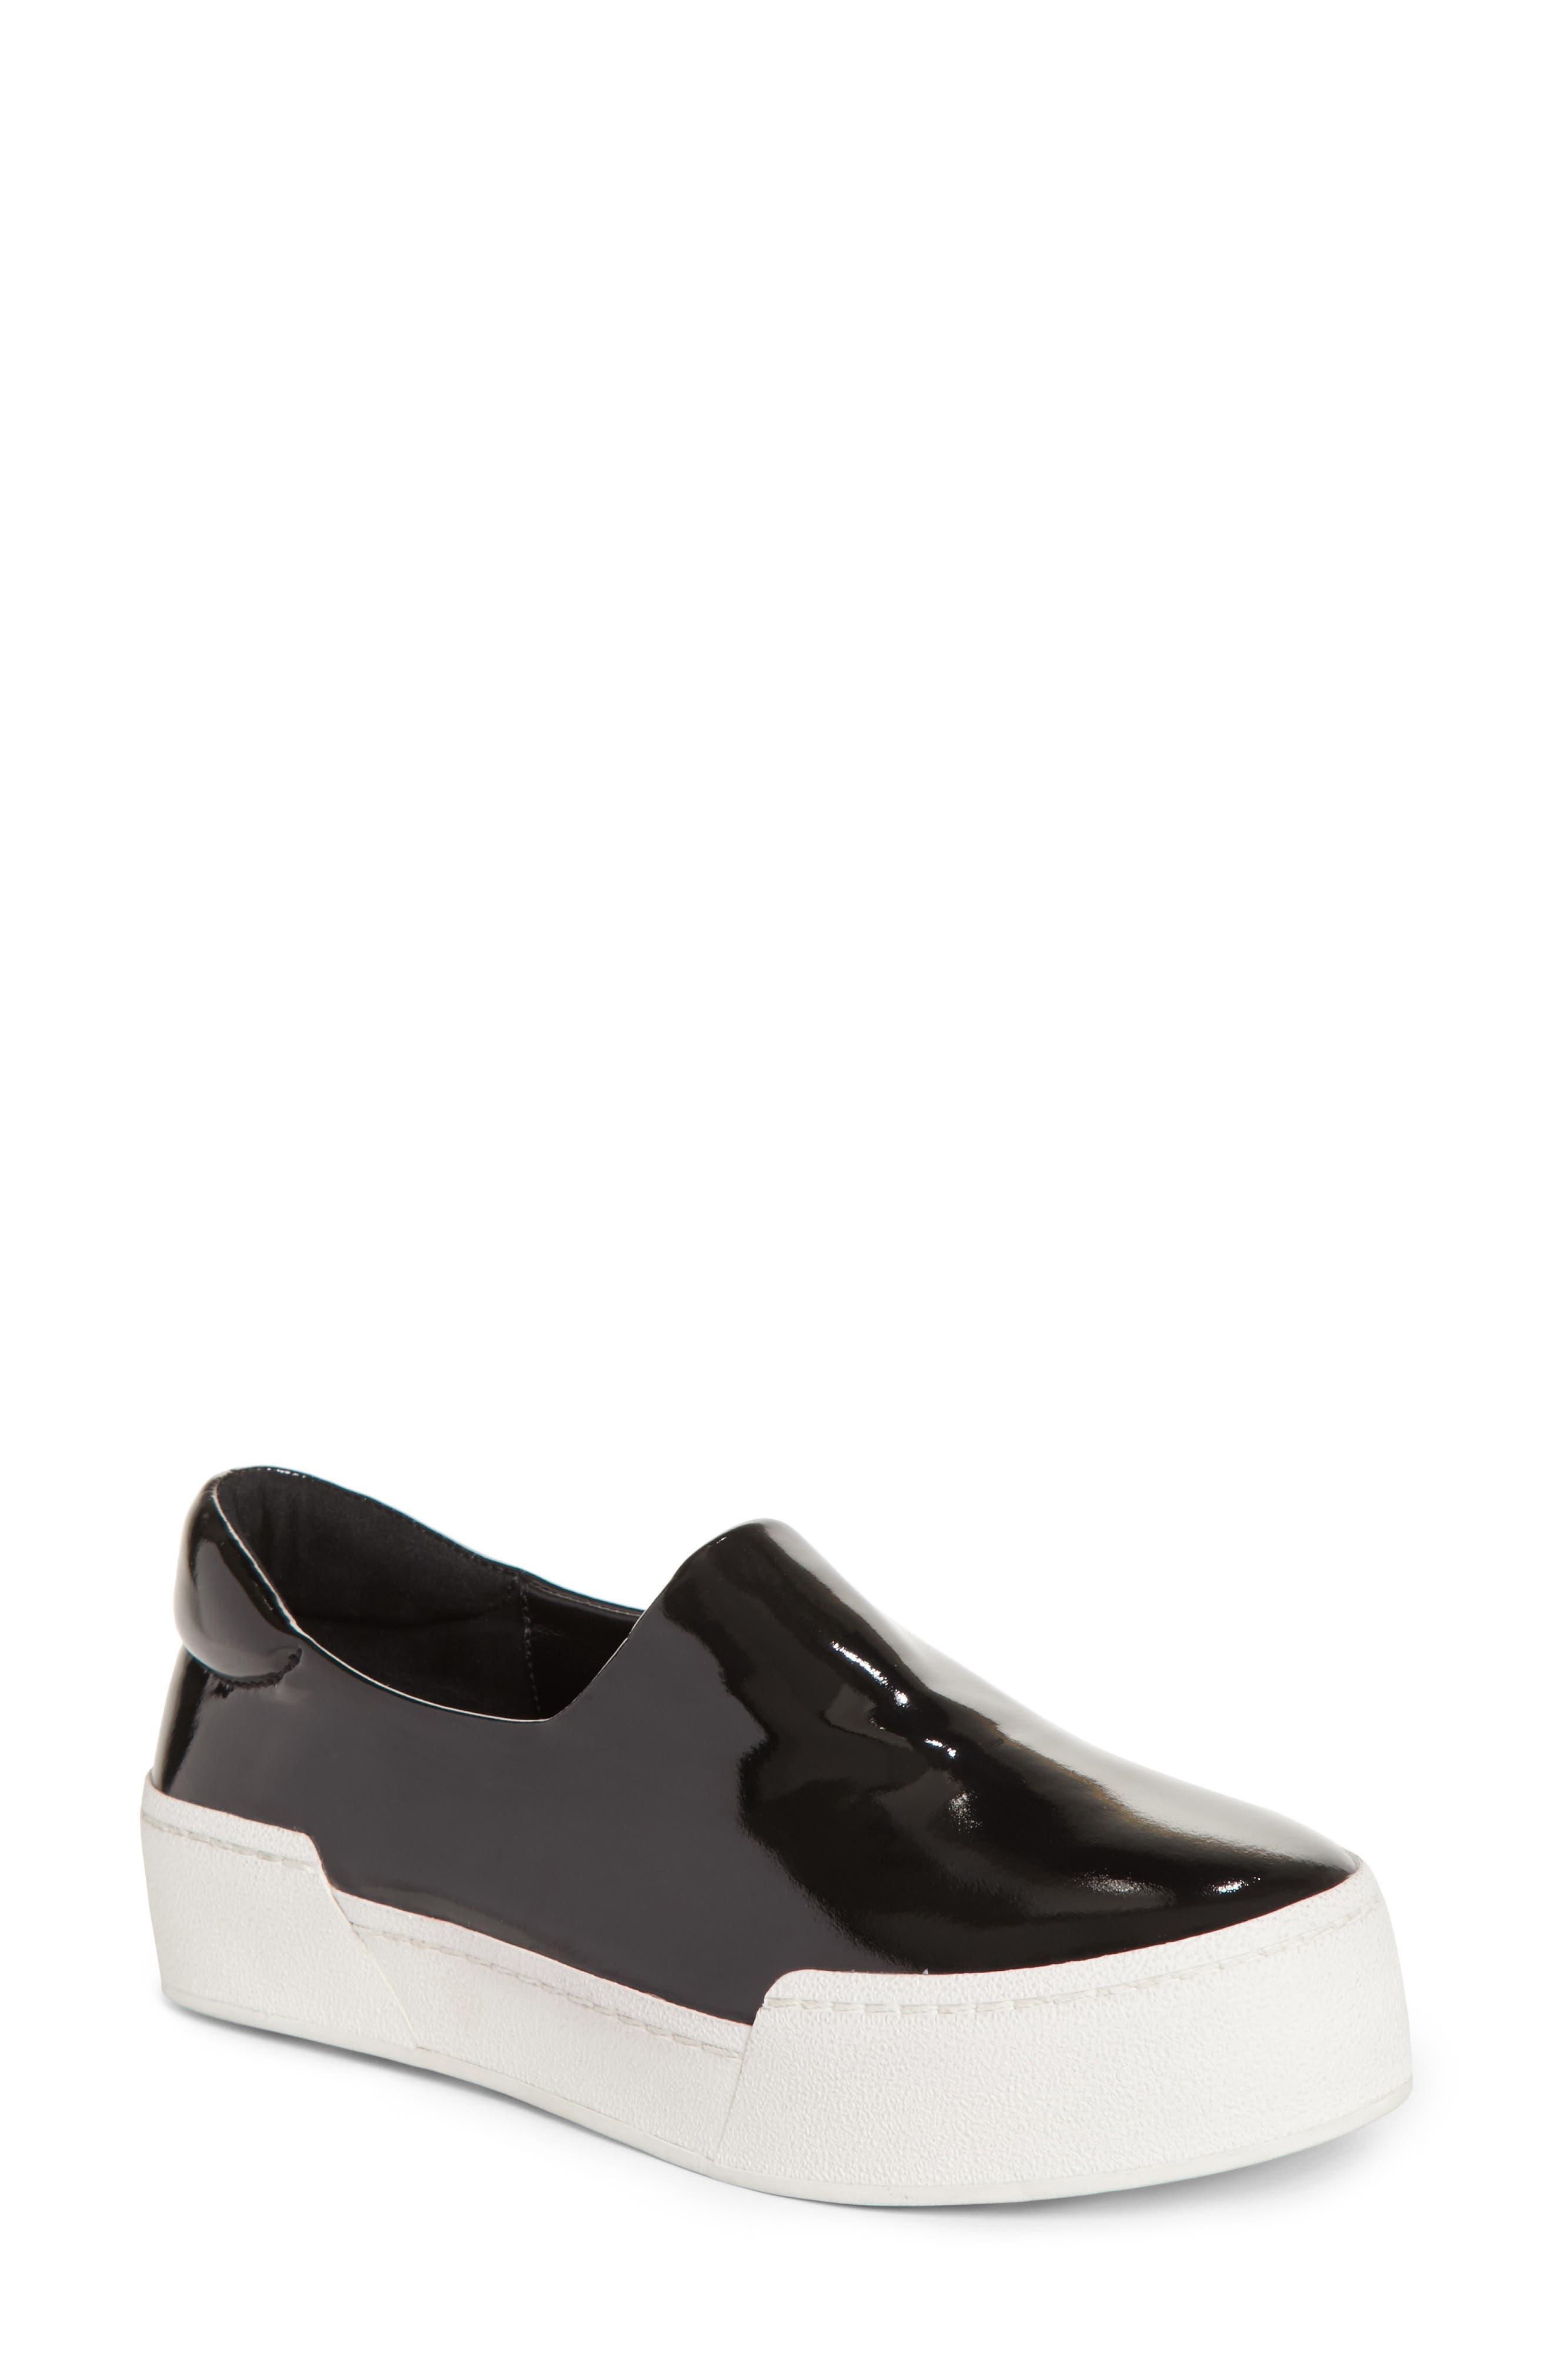 Didi Slip-On Sneaker,                             Main thumbnail 1, color,                             001